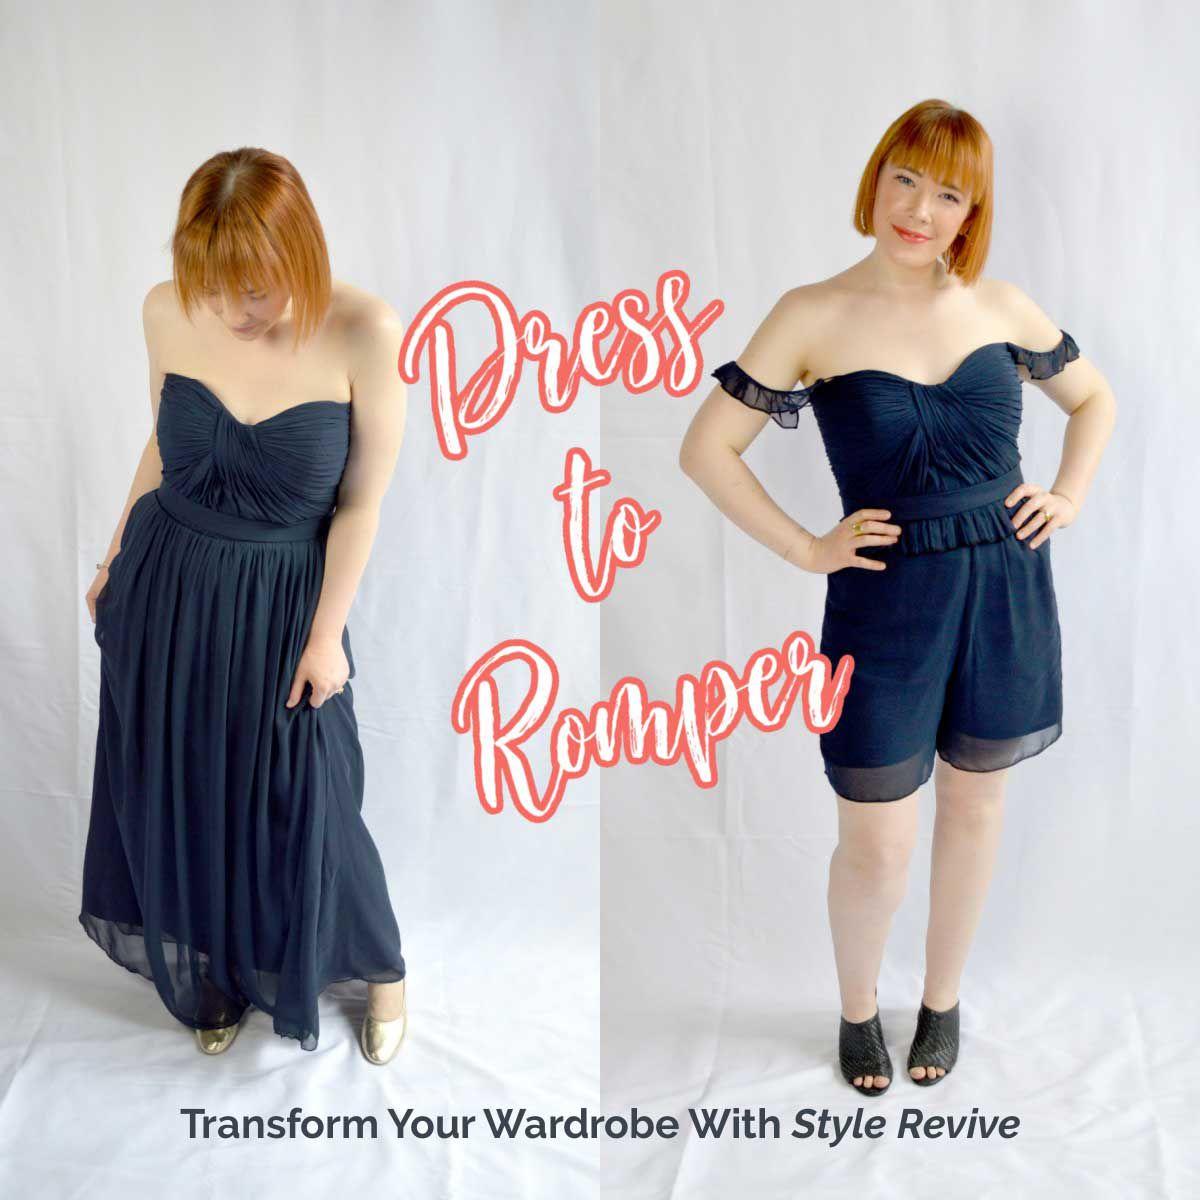 Style Revive Season 1 - Episode 1 Dress to Romper